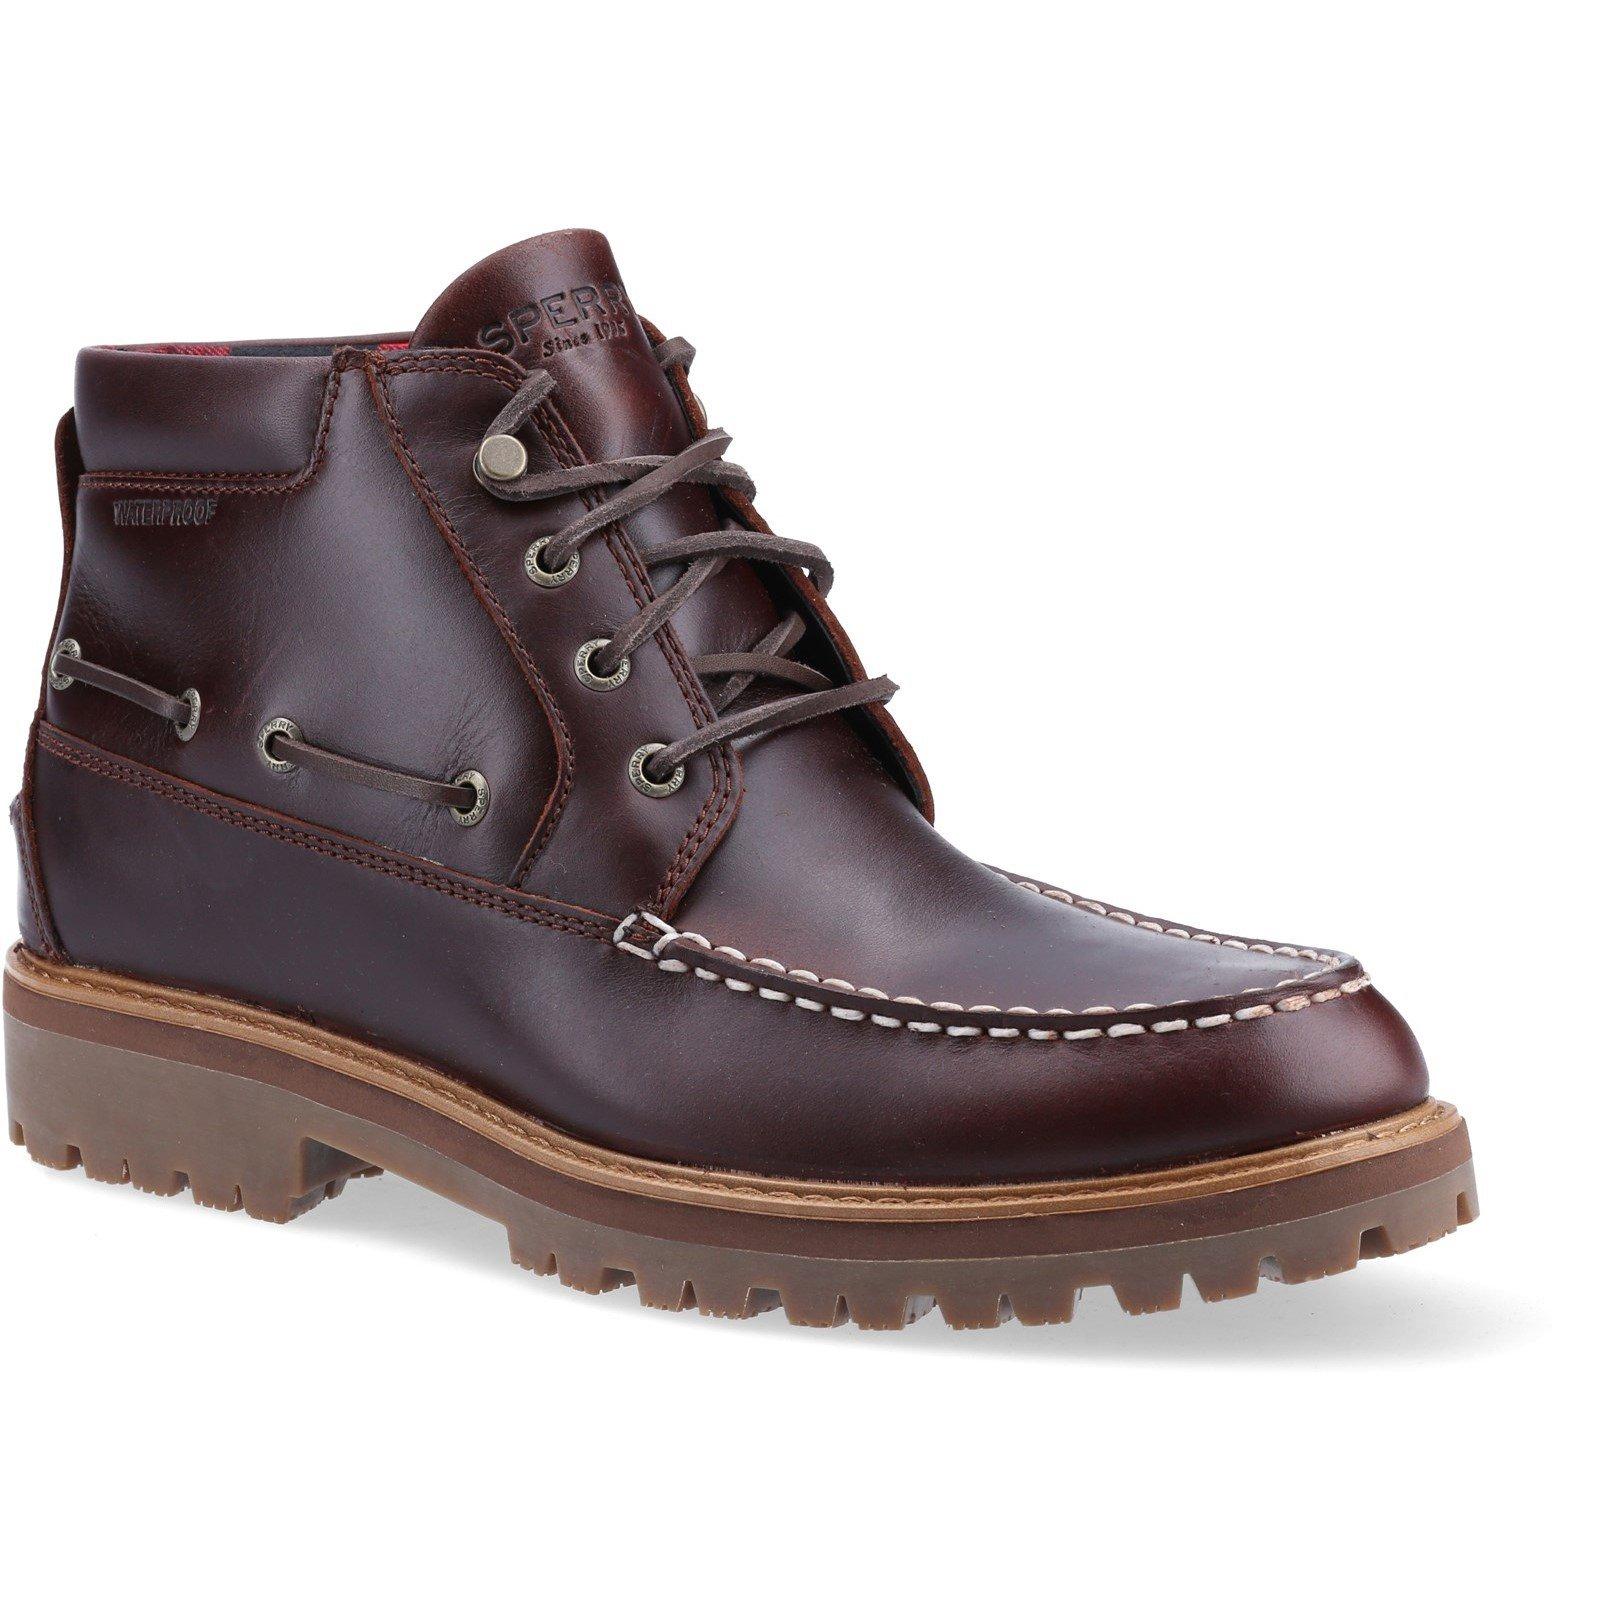 Sperry Men's Authentic Original Lug Chukka Boot Various Colours 32068 - Amaretto 6